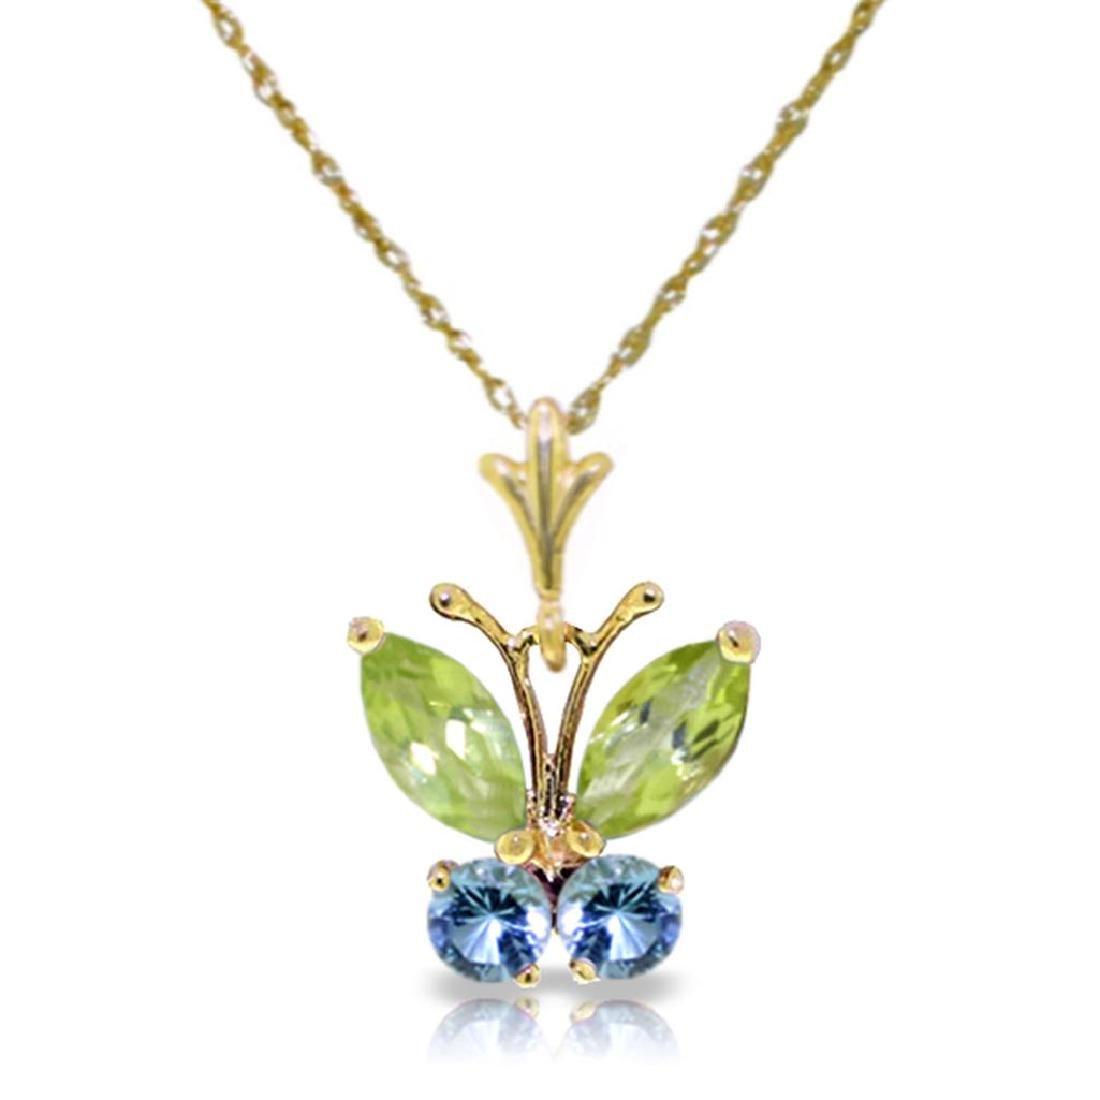 0.6 Carat 14K Solid Gold Butterfly Necklace Blue Topaz